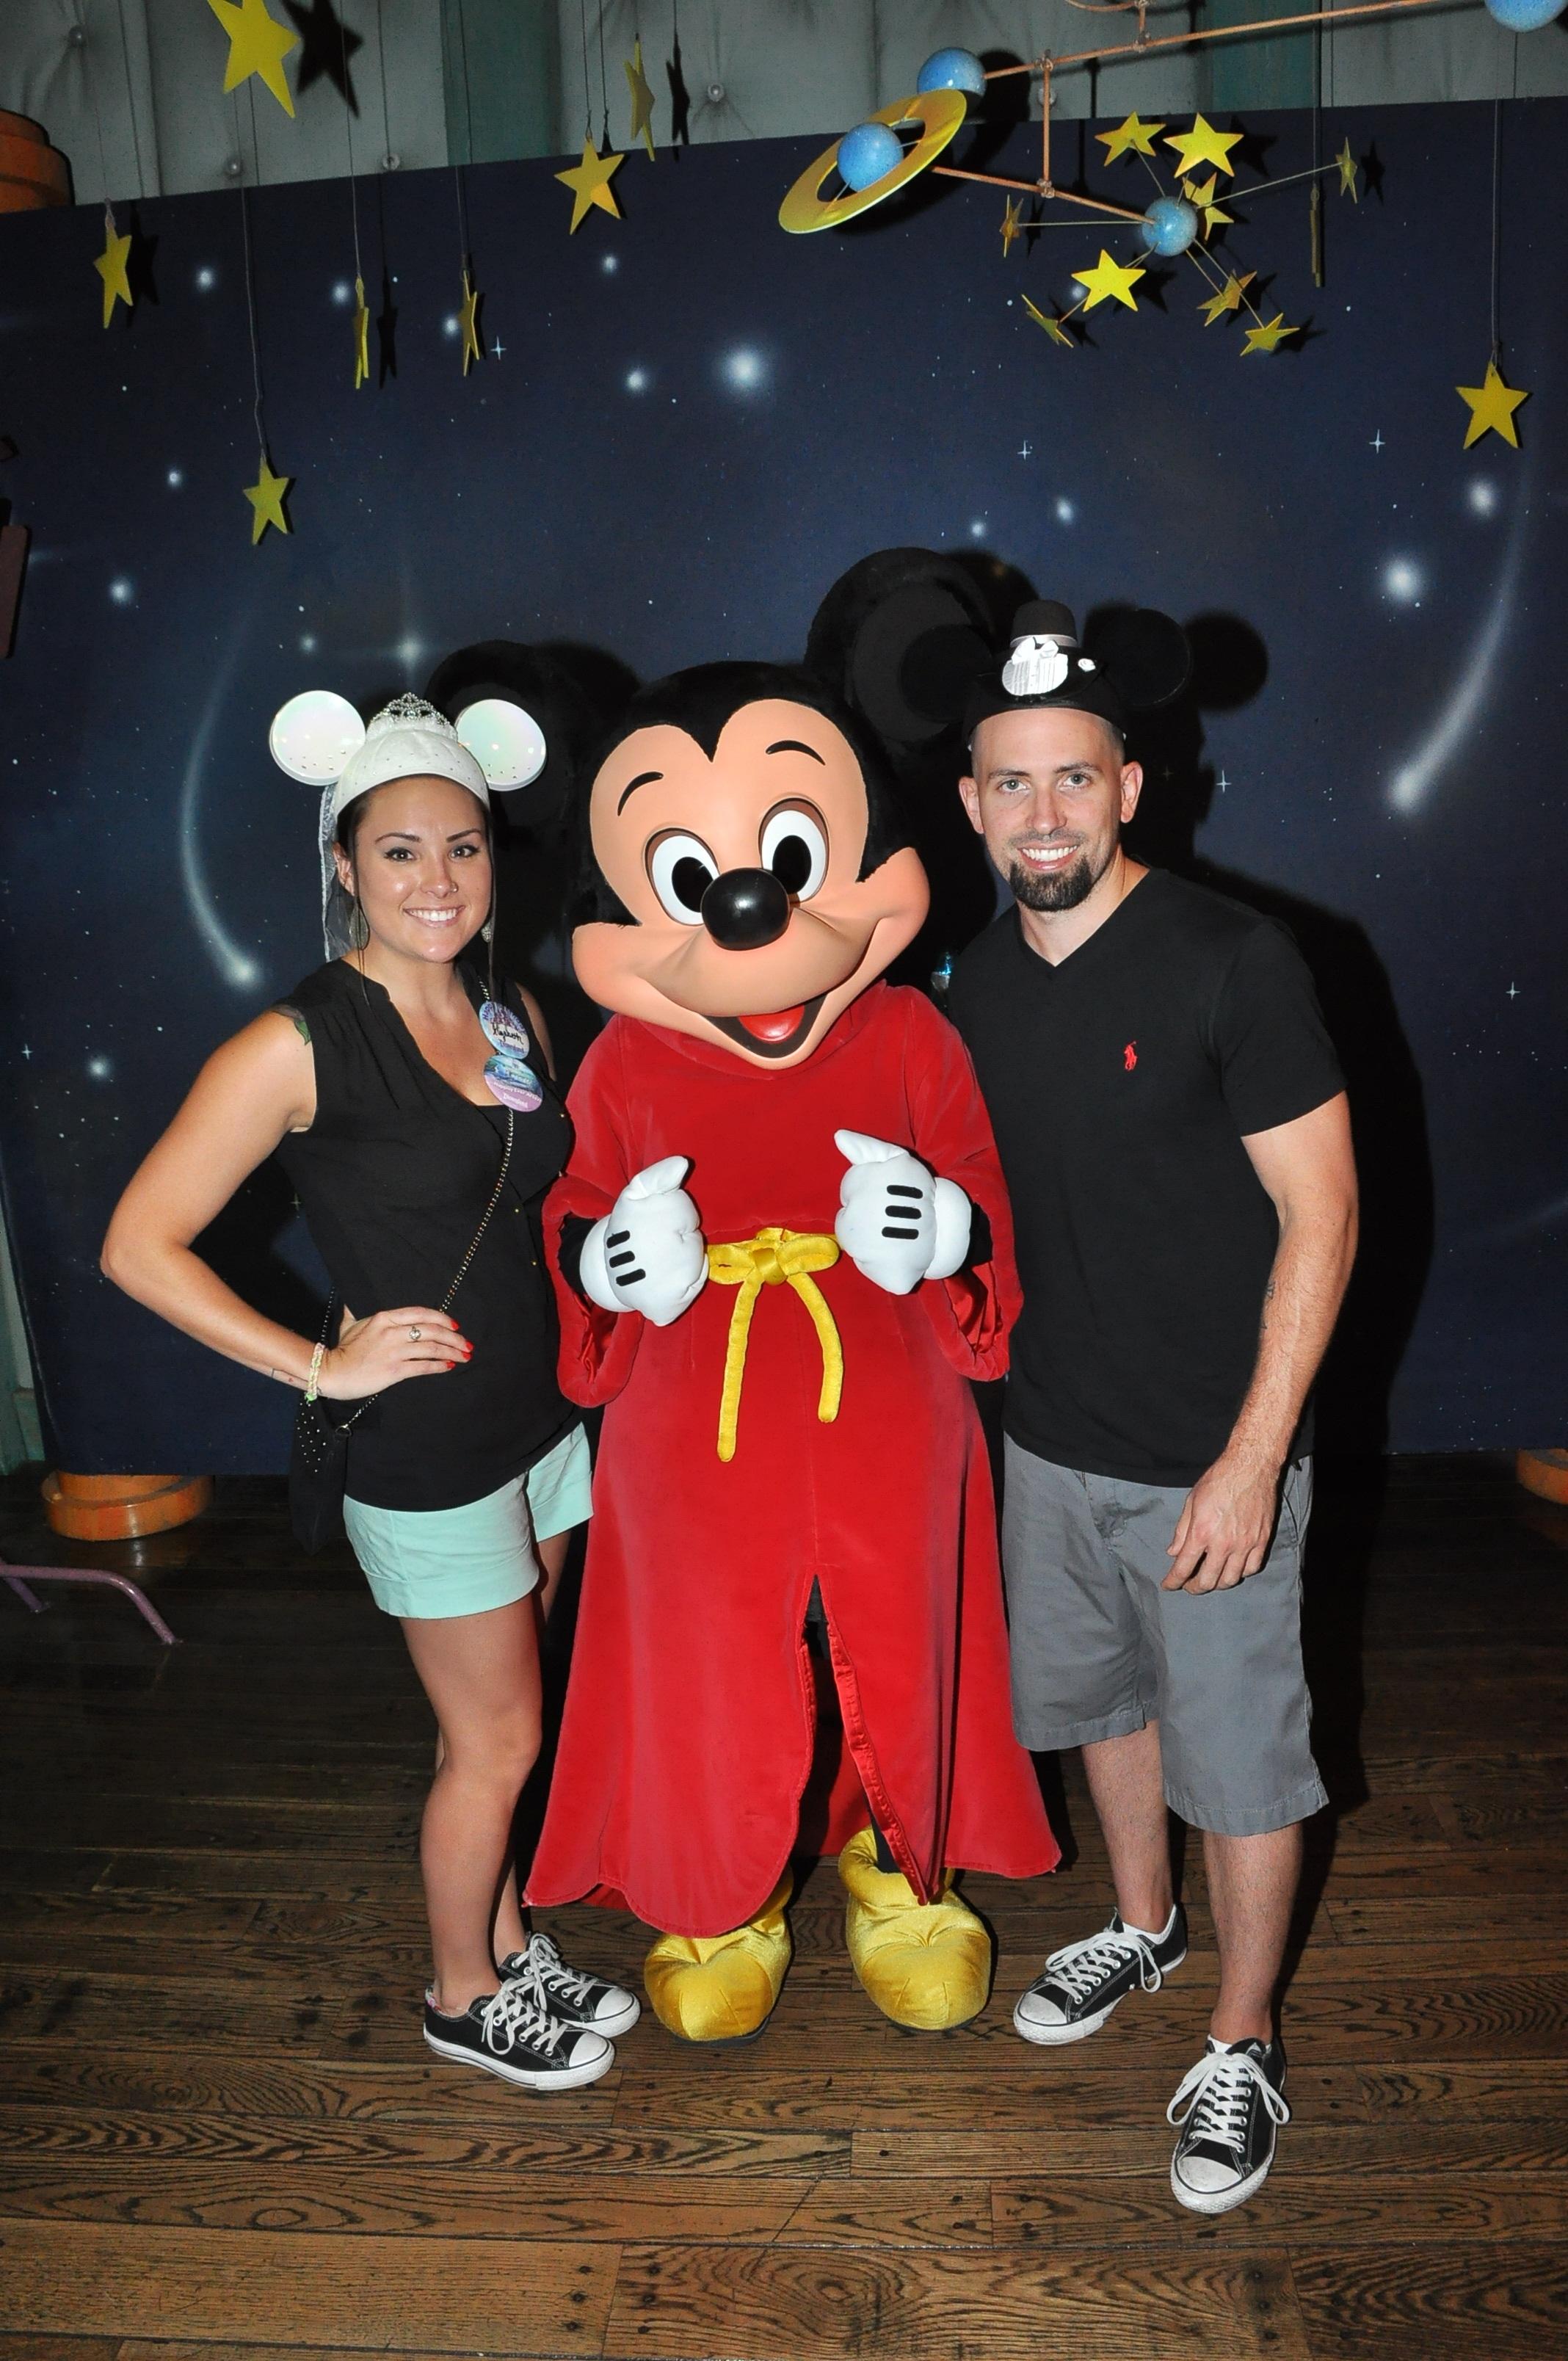 Image 1 of Elizabeth and Tommy's Disneyland Proposal